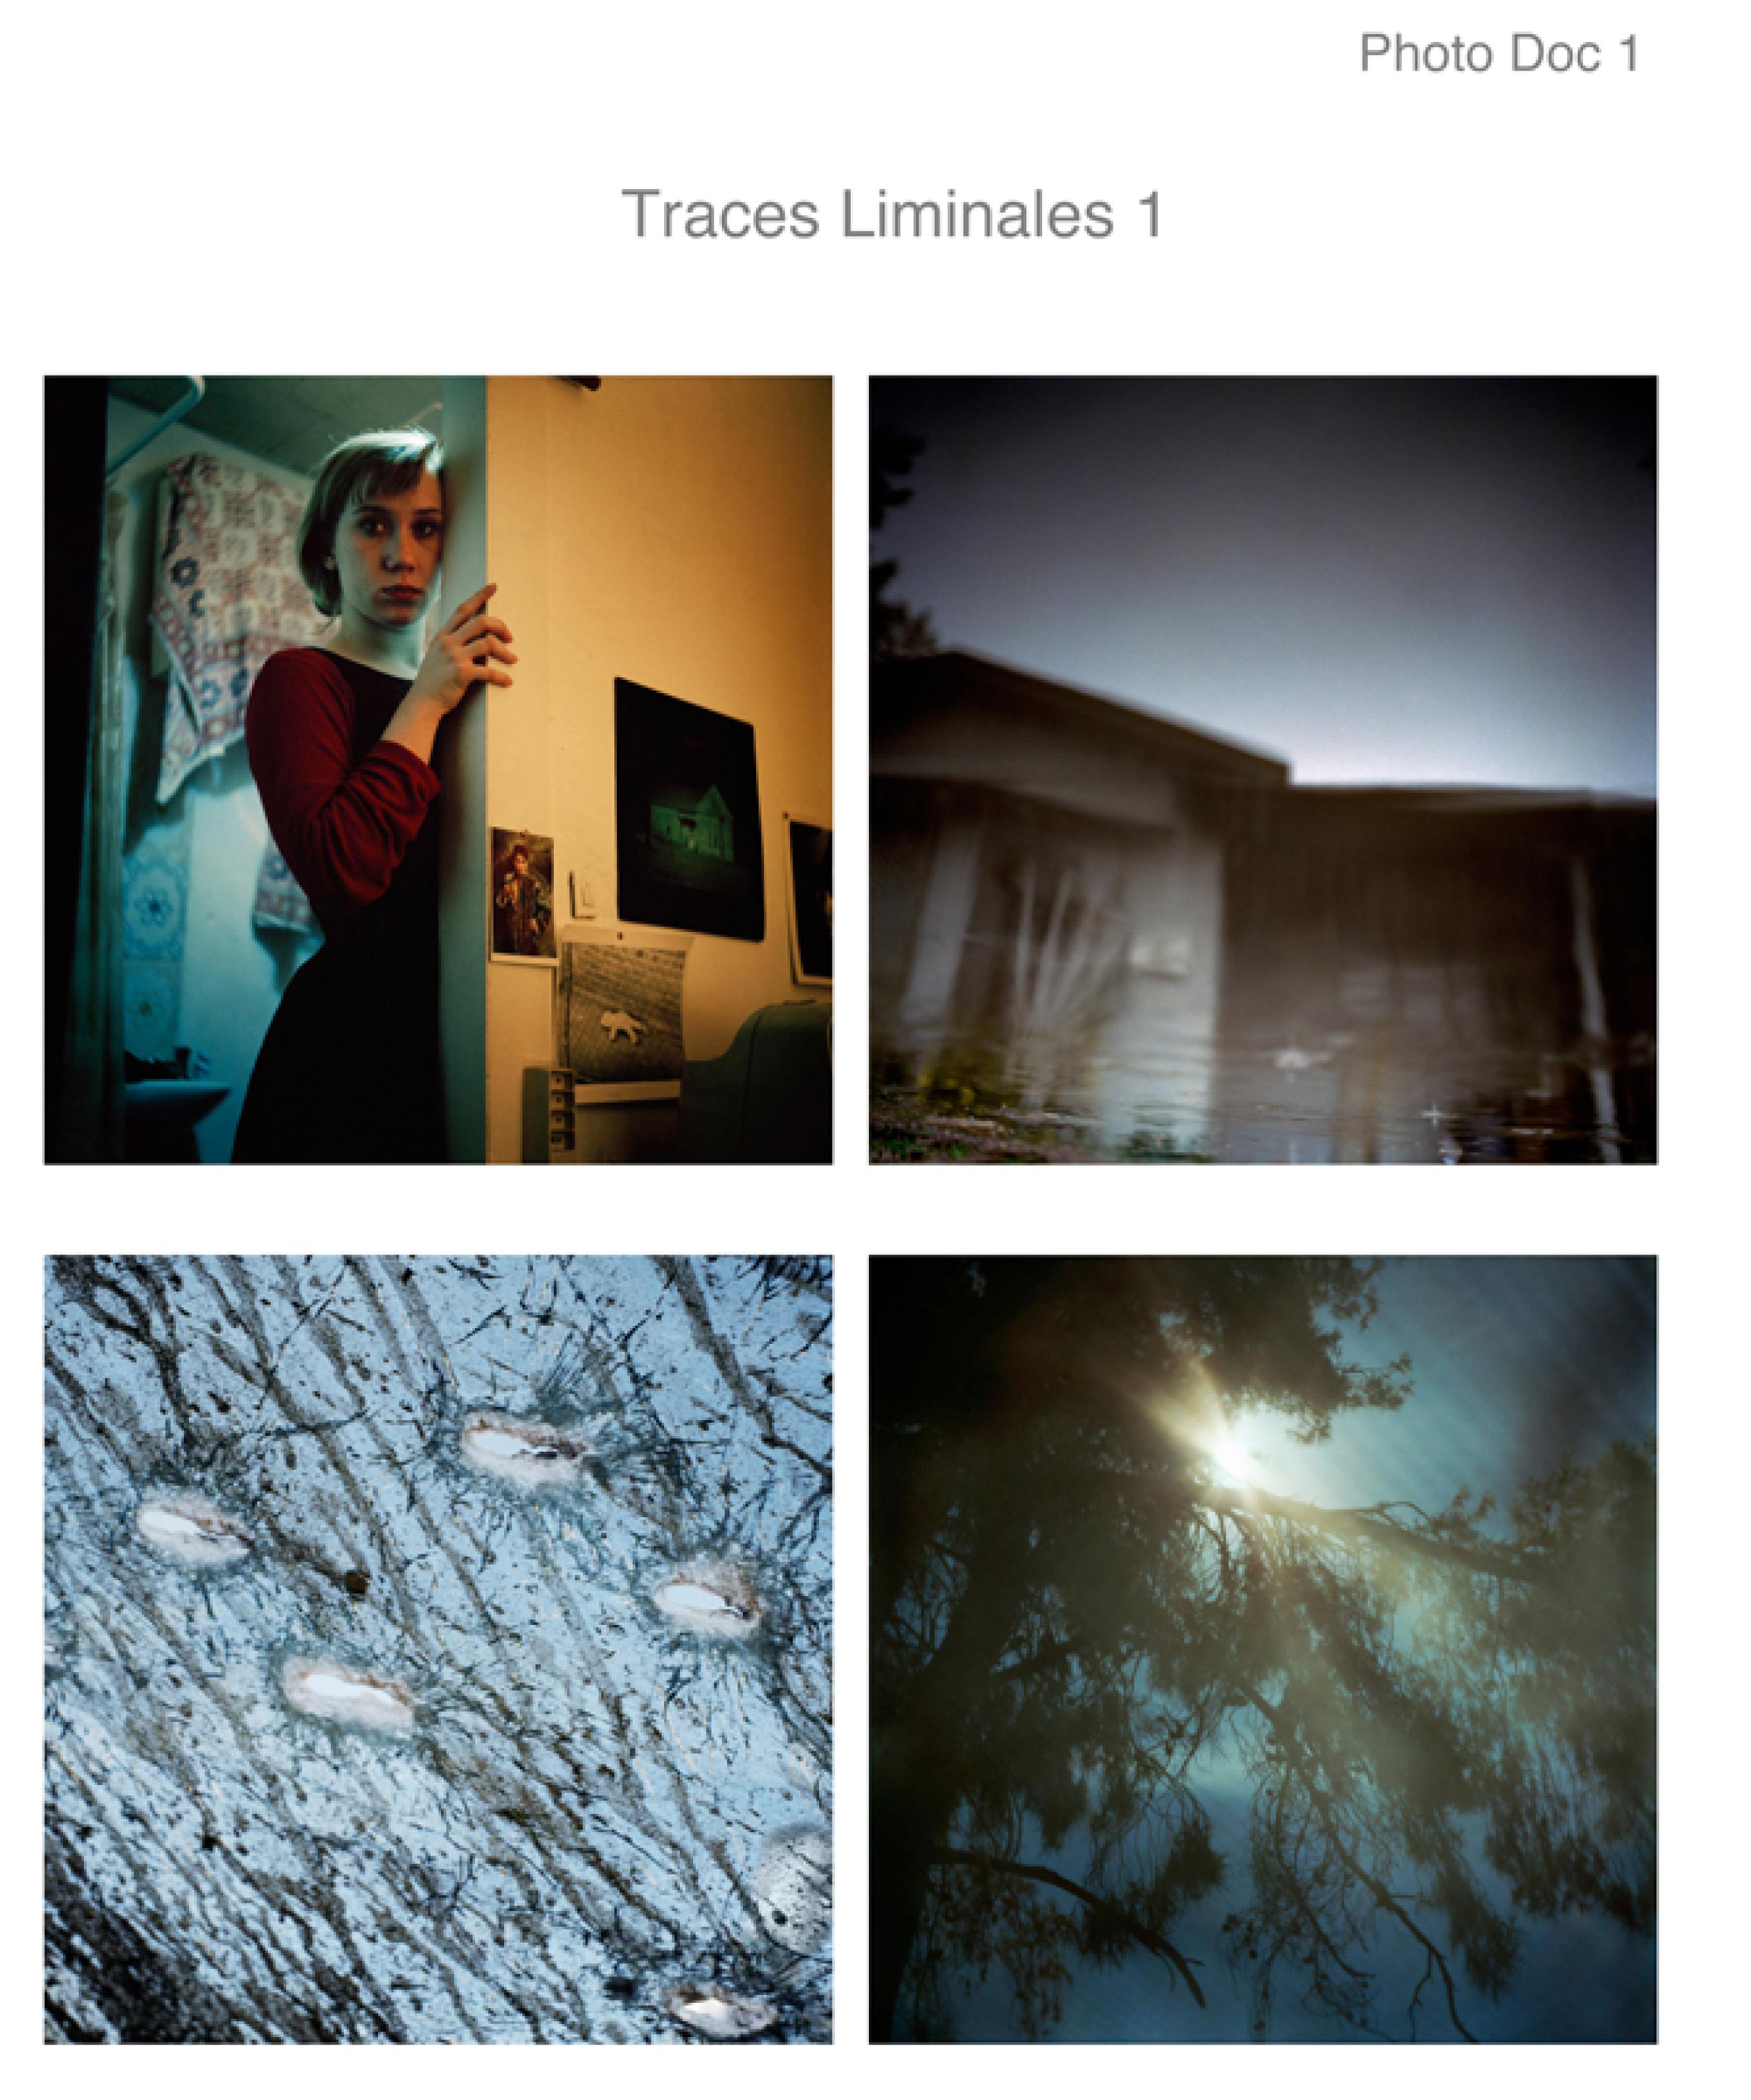 Traces_Liminales-1